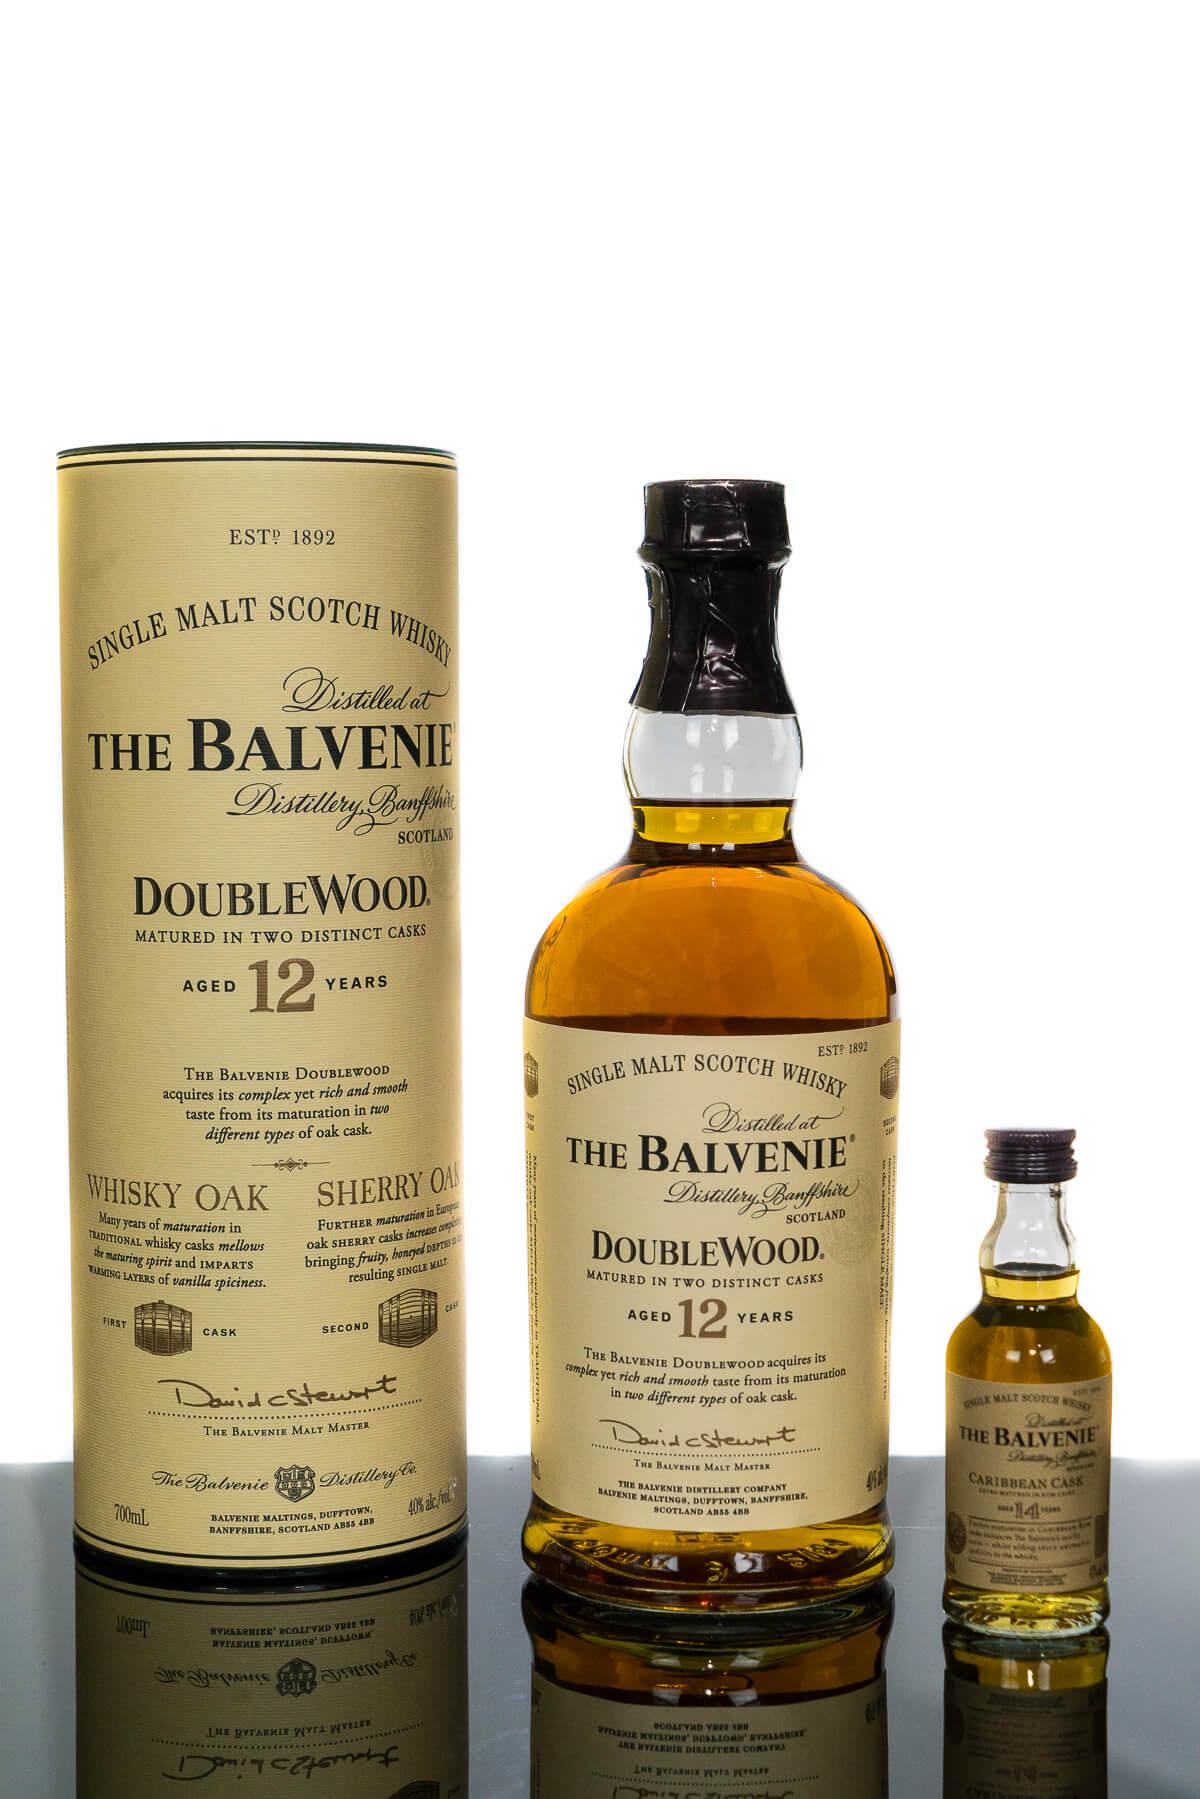 The Balvenie Aged 12 Years Doublewood Speyside Single Malt Scotch Whisky PLUS Balvenie 14YO Miniature